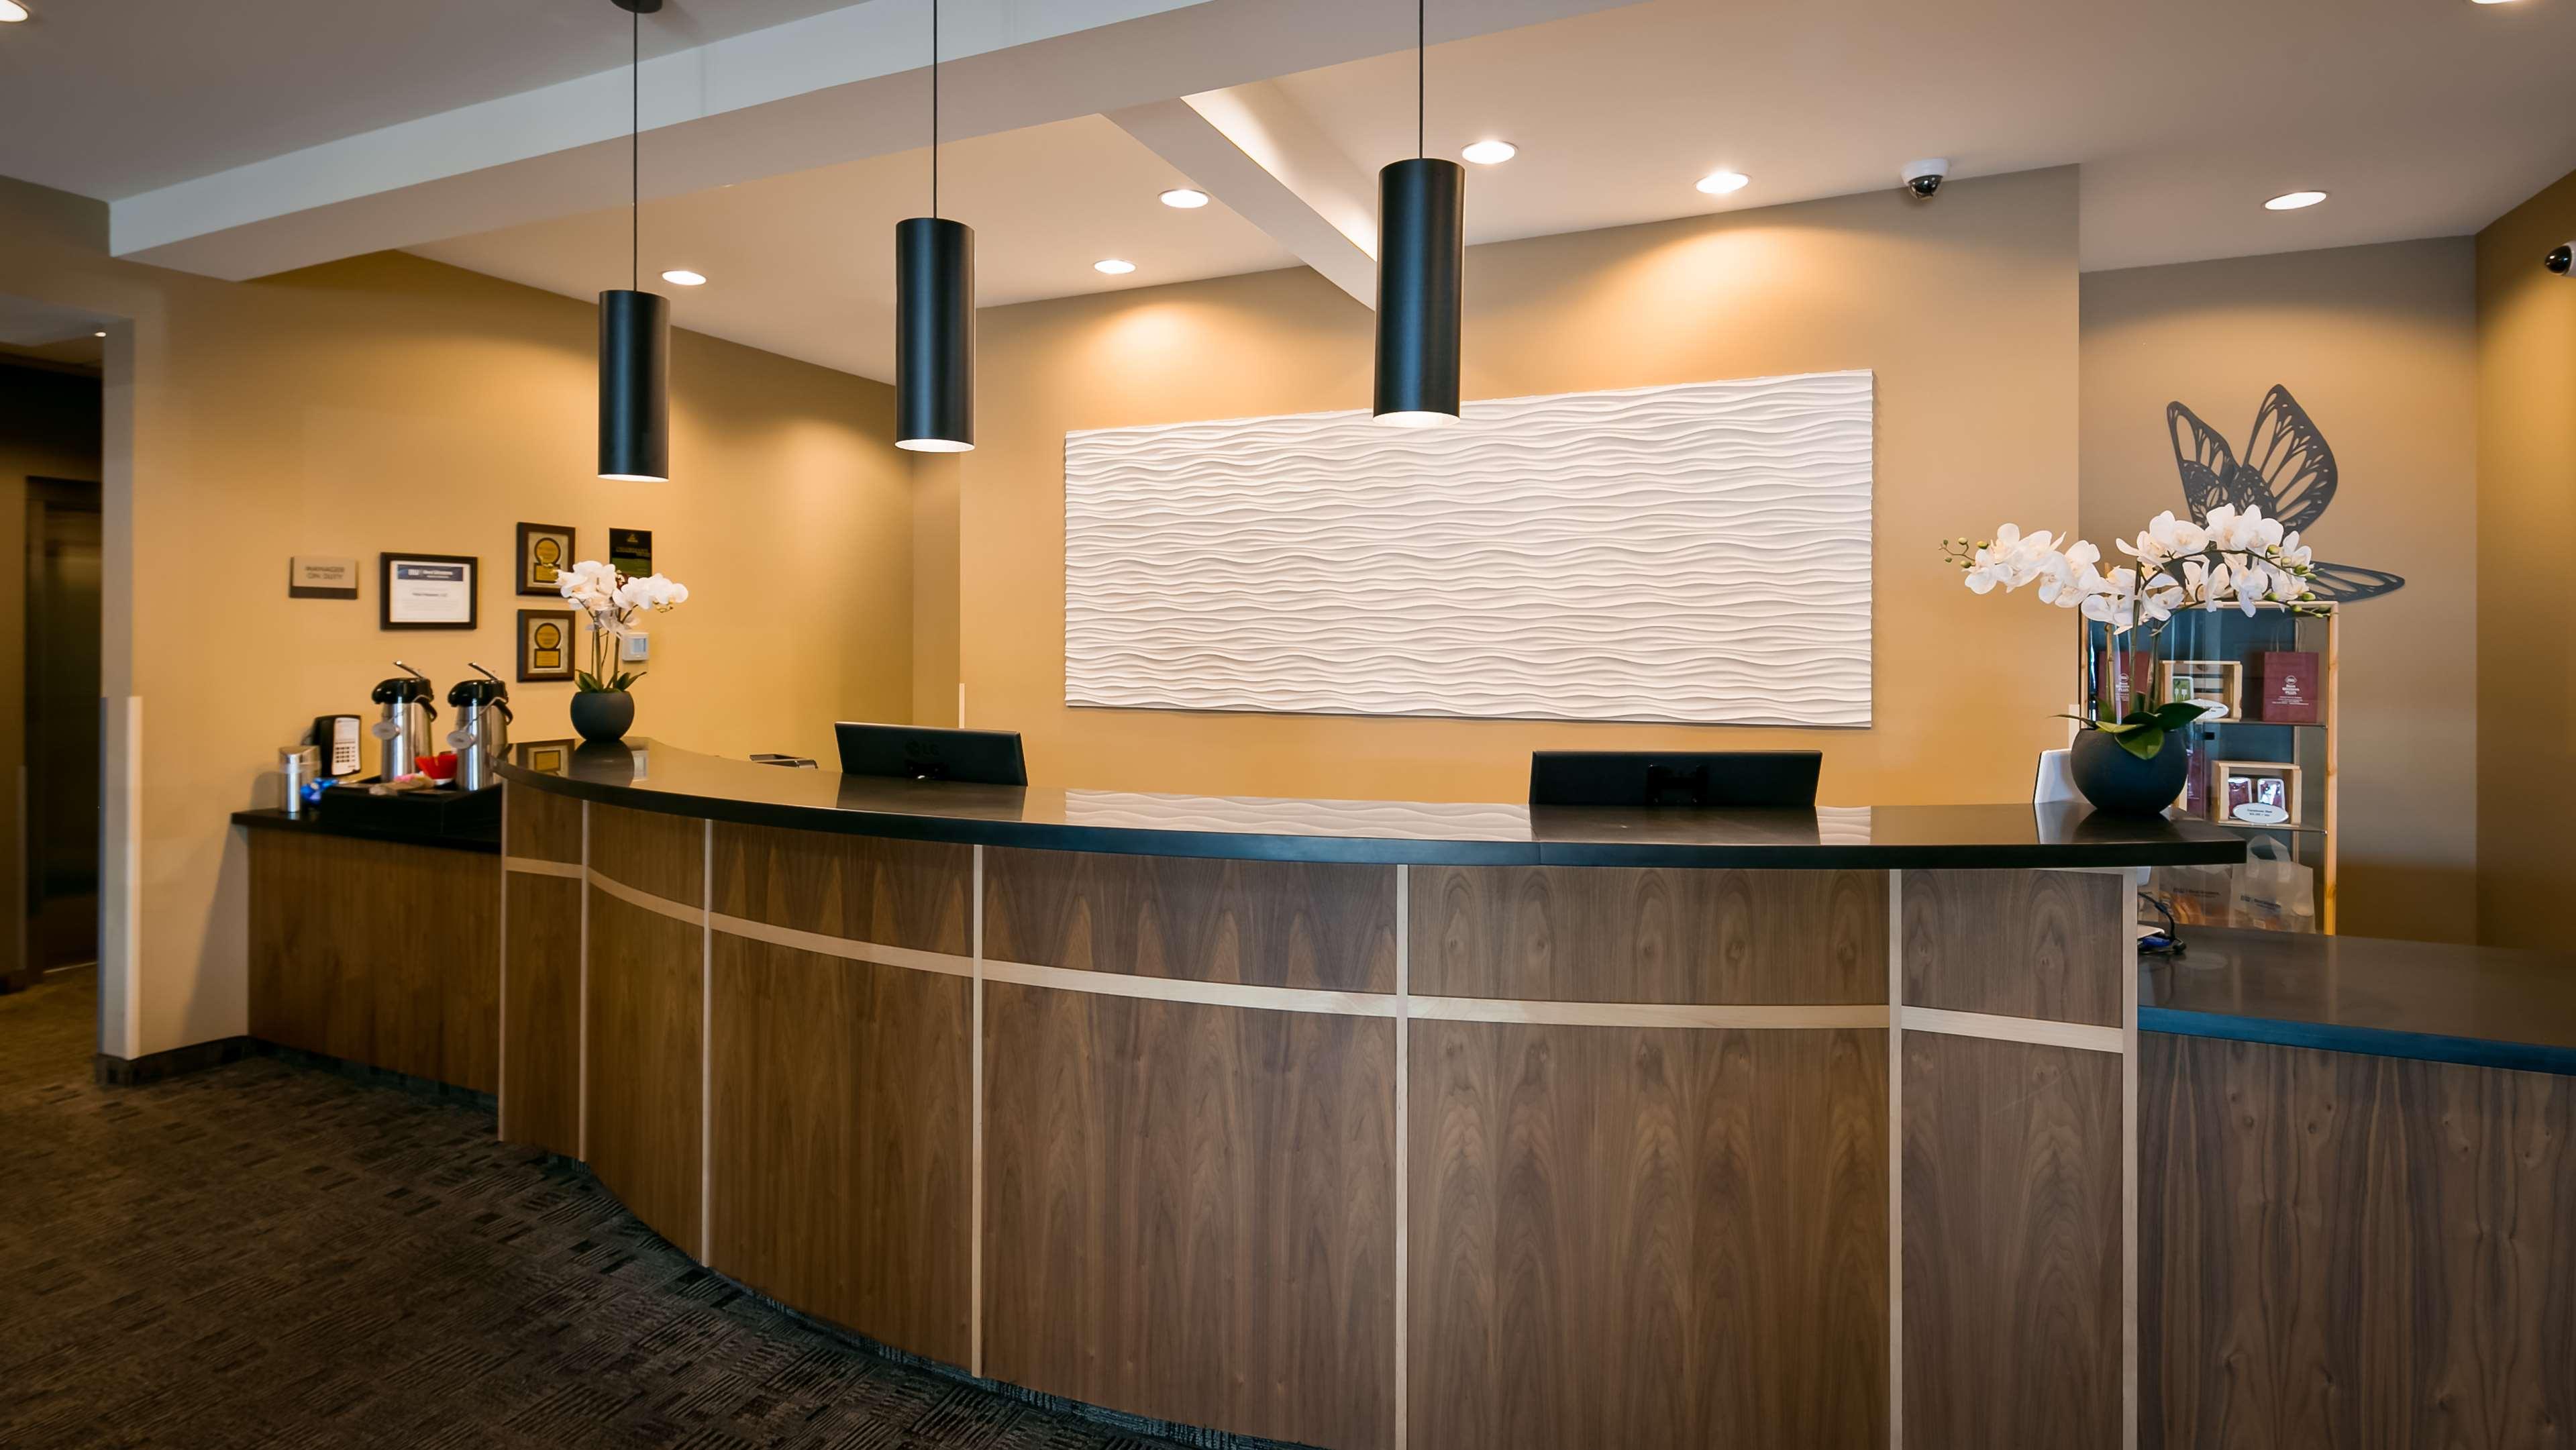 Best Western Plus Lacey Inn & Suites image 2